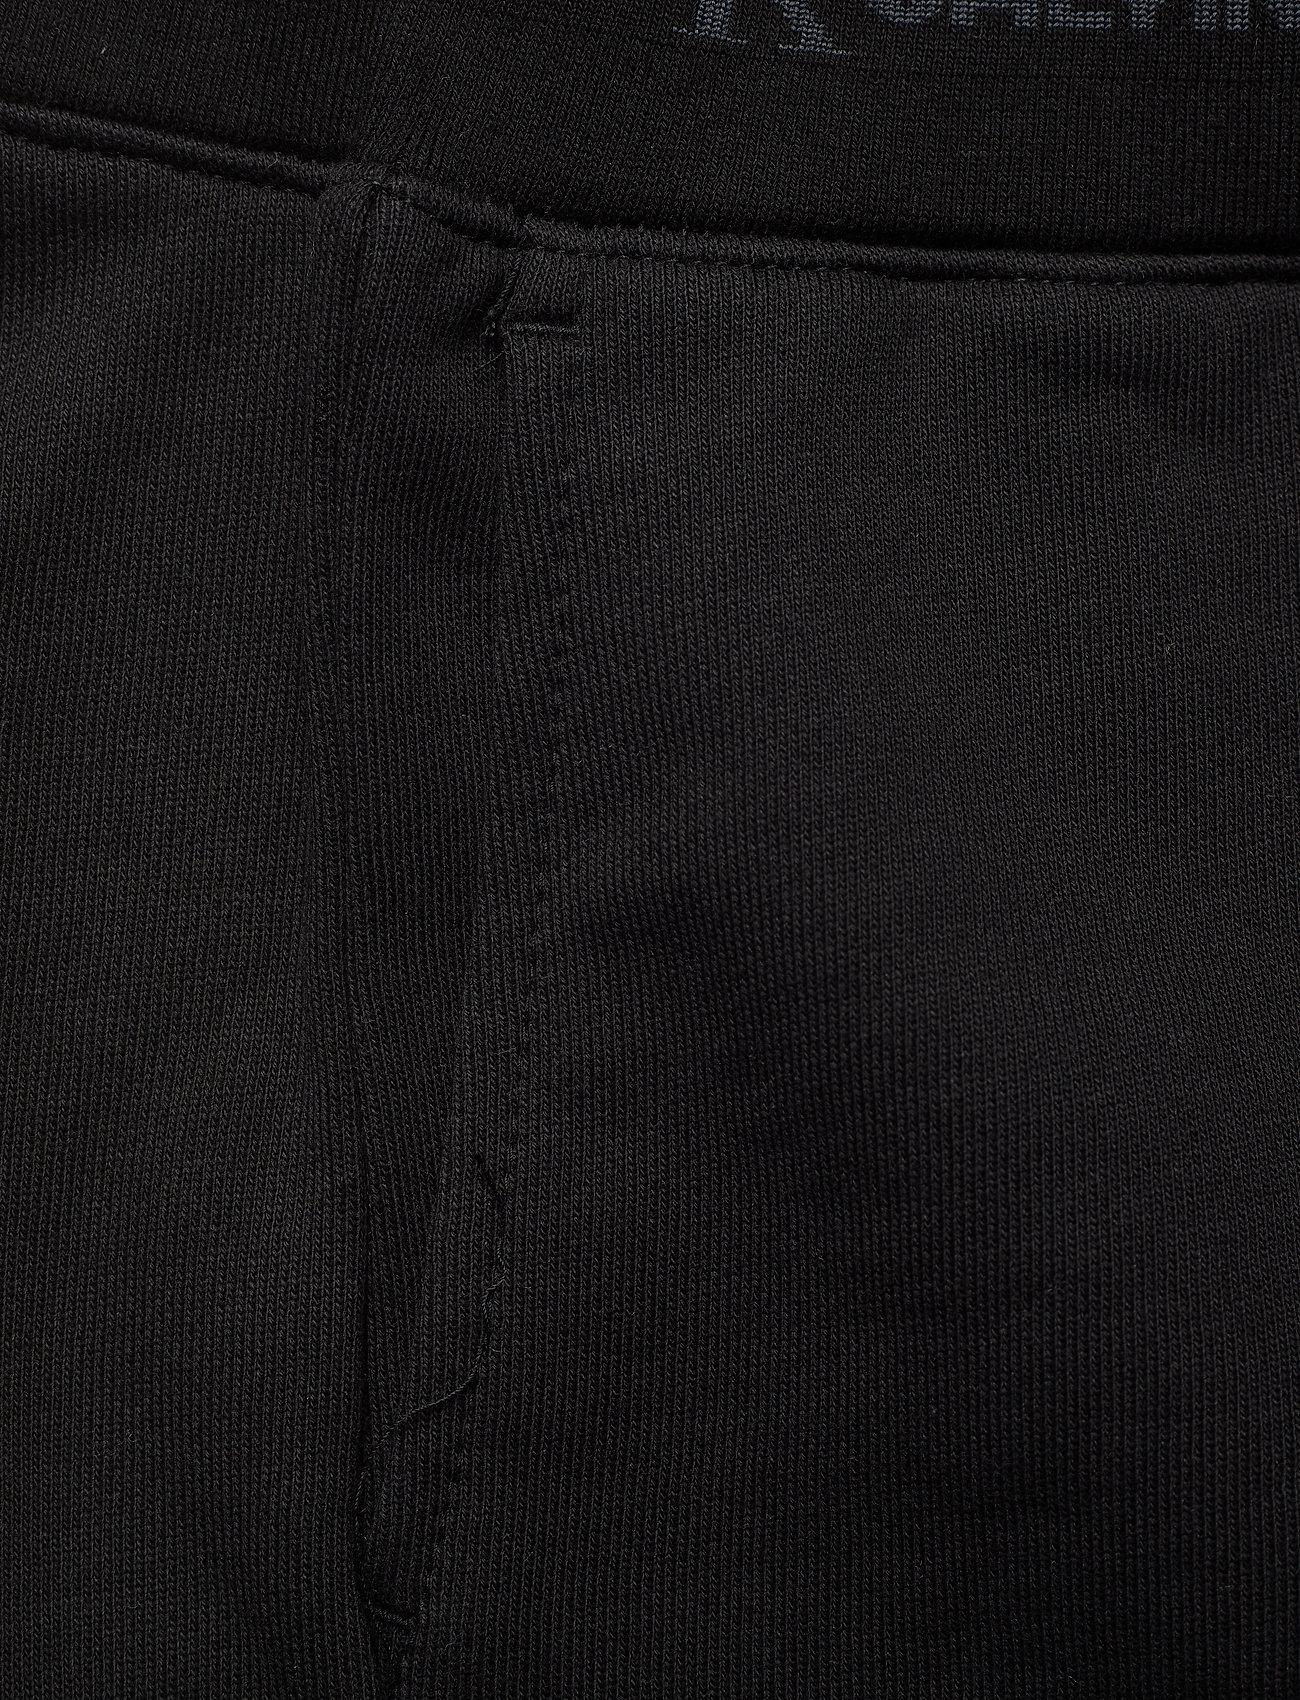 Calvin Klein Jeans - LOGO TRIM KNIT SHORT - casual shorts - ck black - 2